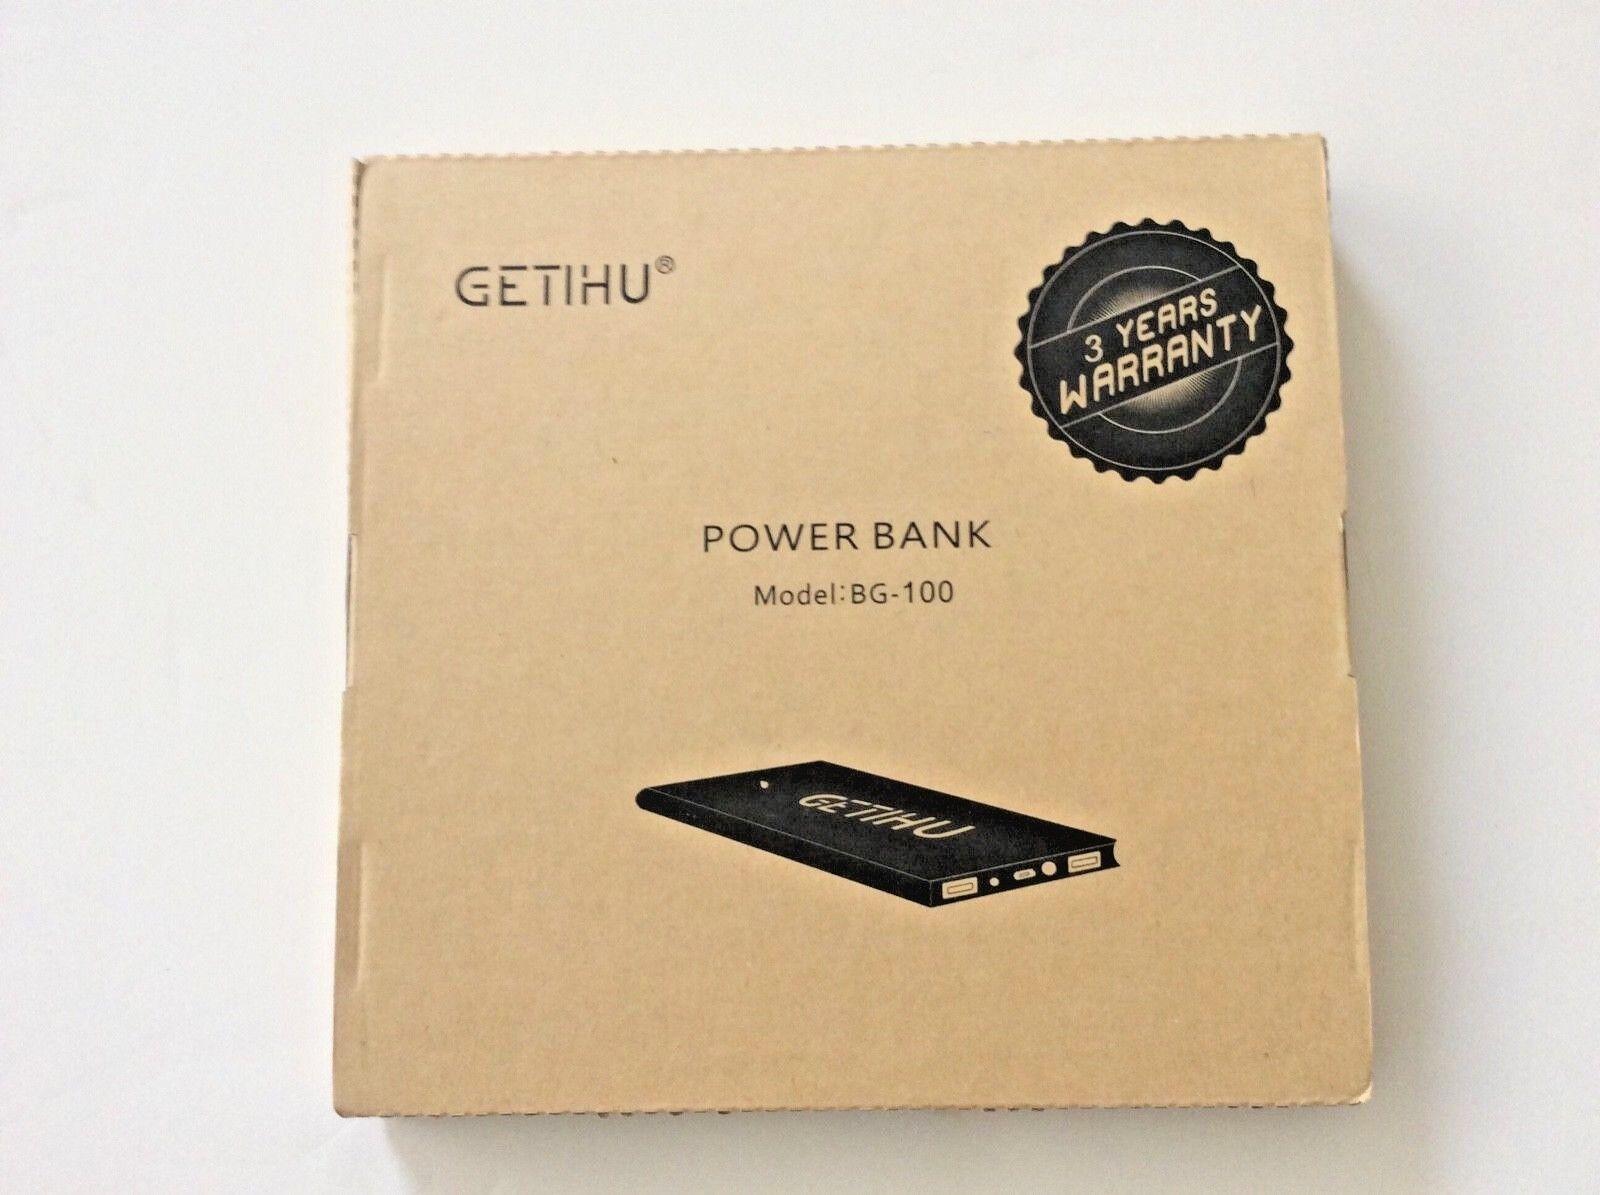 GETIHU Phone Charger 10000mAh Portable Power Bank Ultra Slim